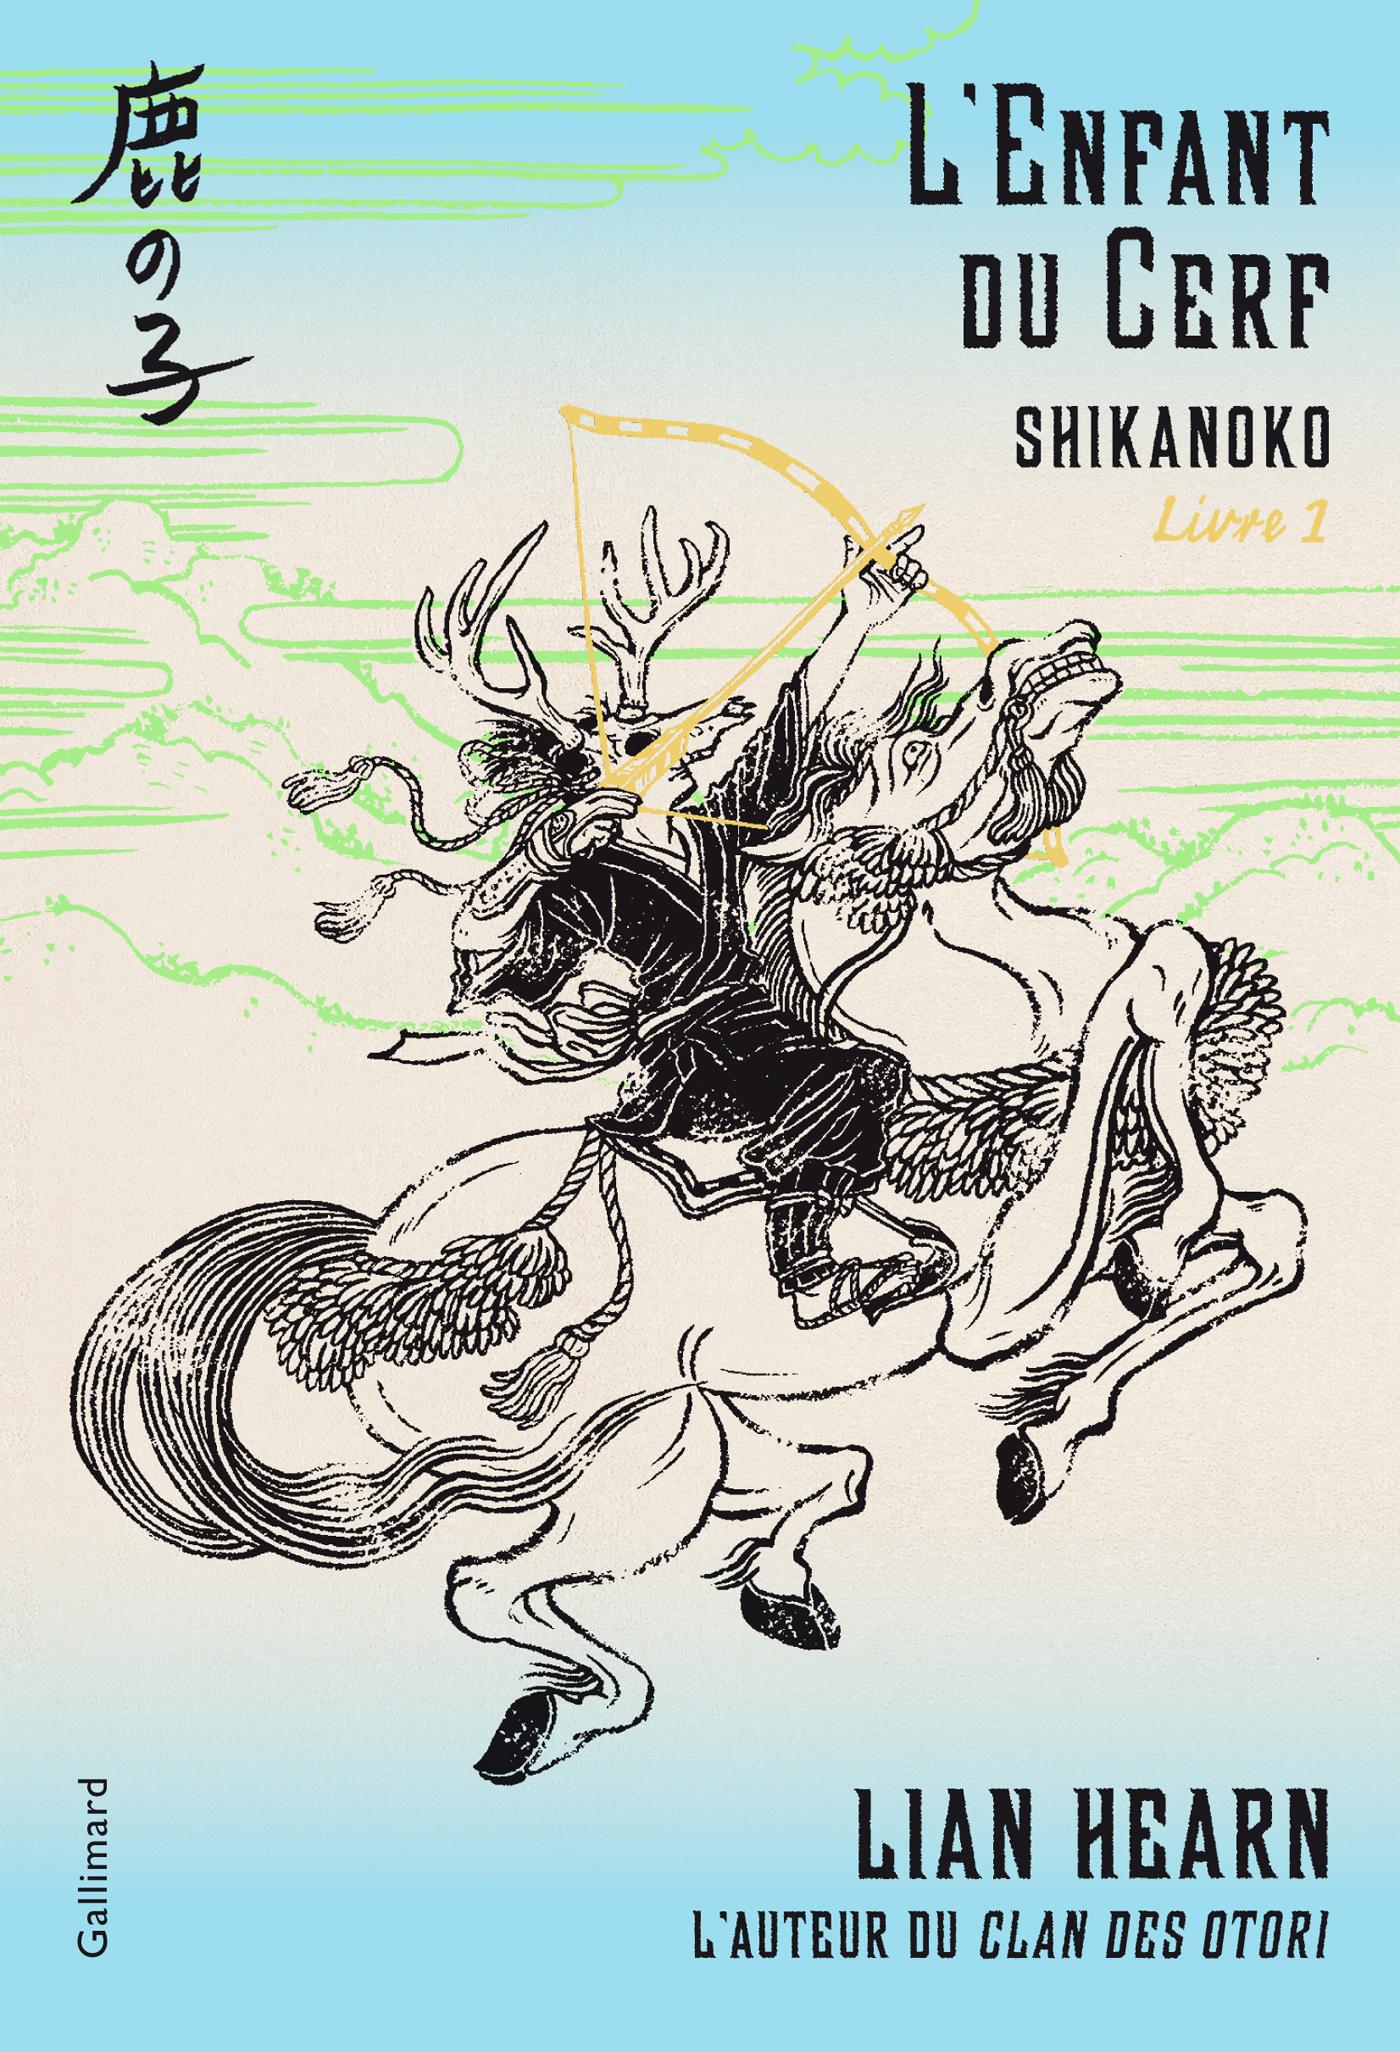 Shikanoko (Livre 1) - L'Enfant du Cerf | Hearn, Lian